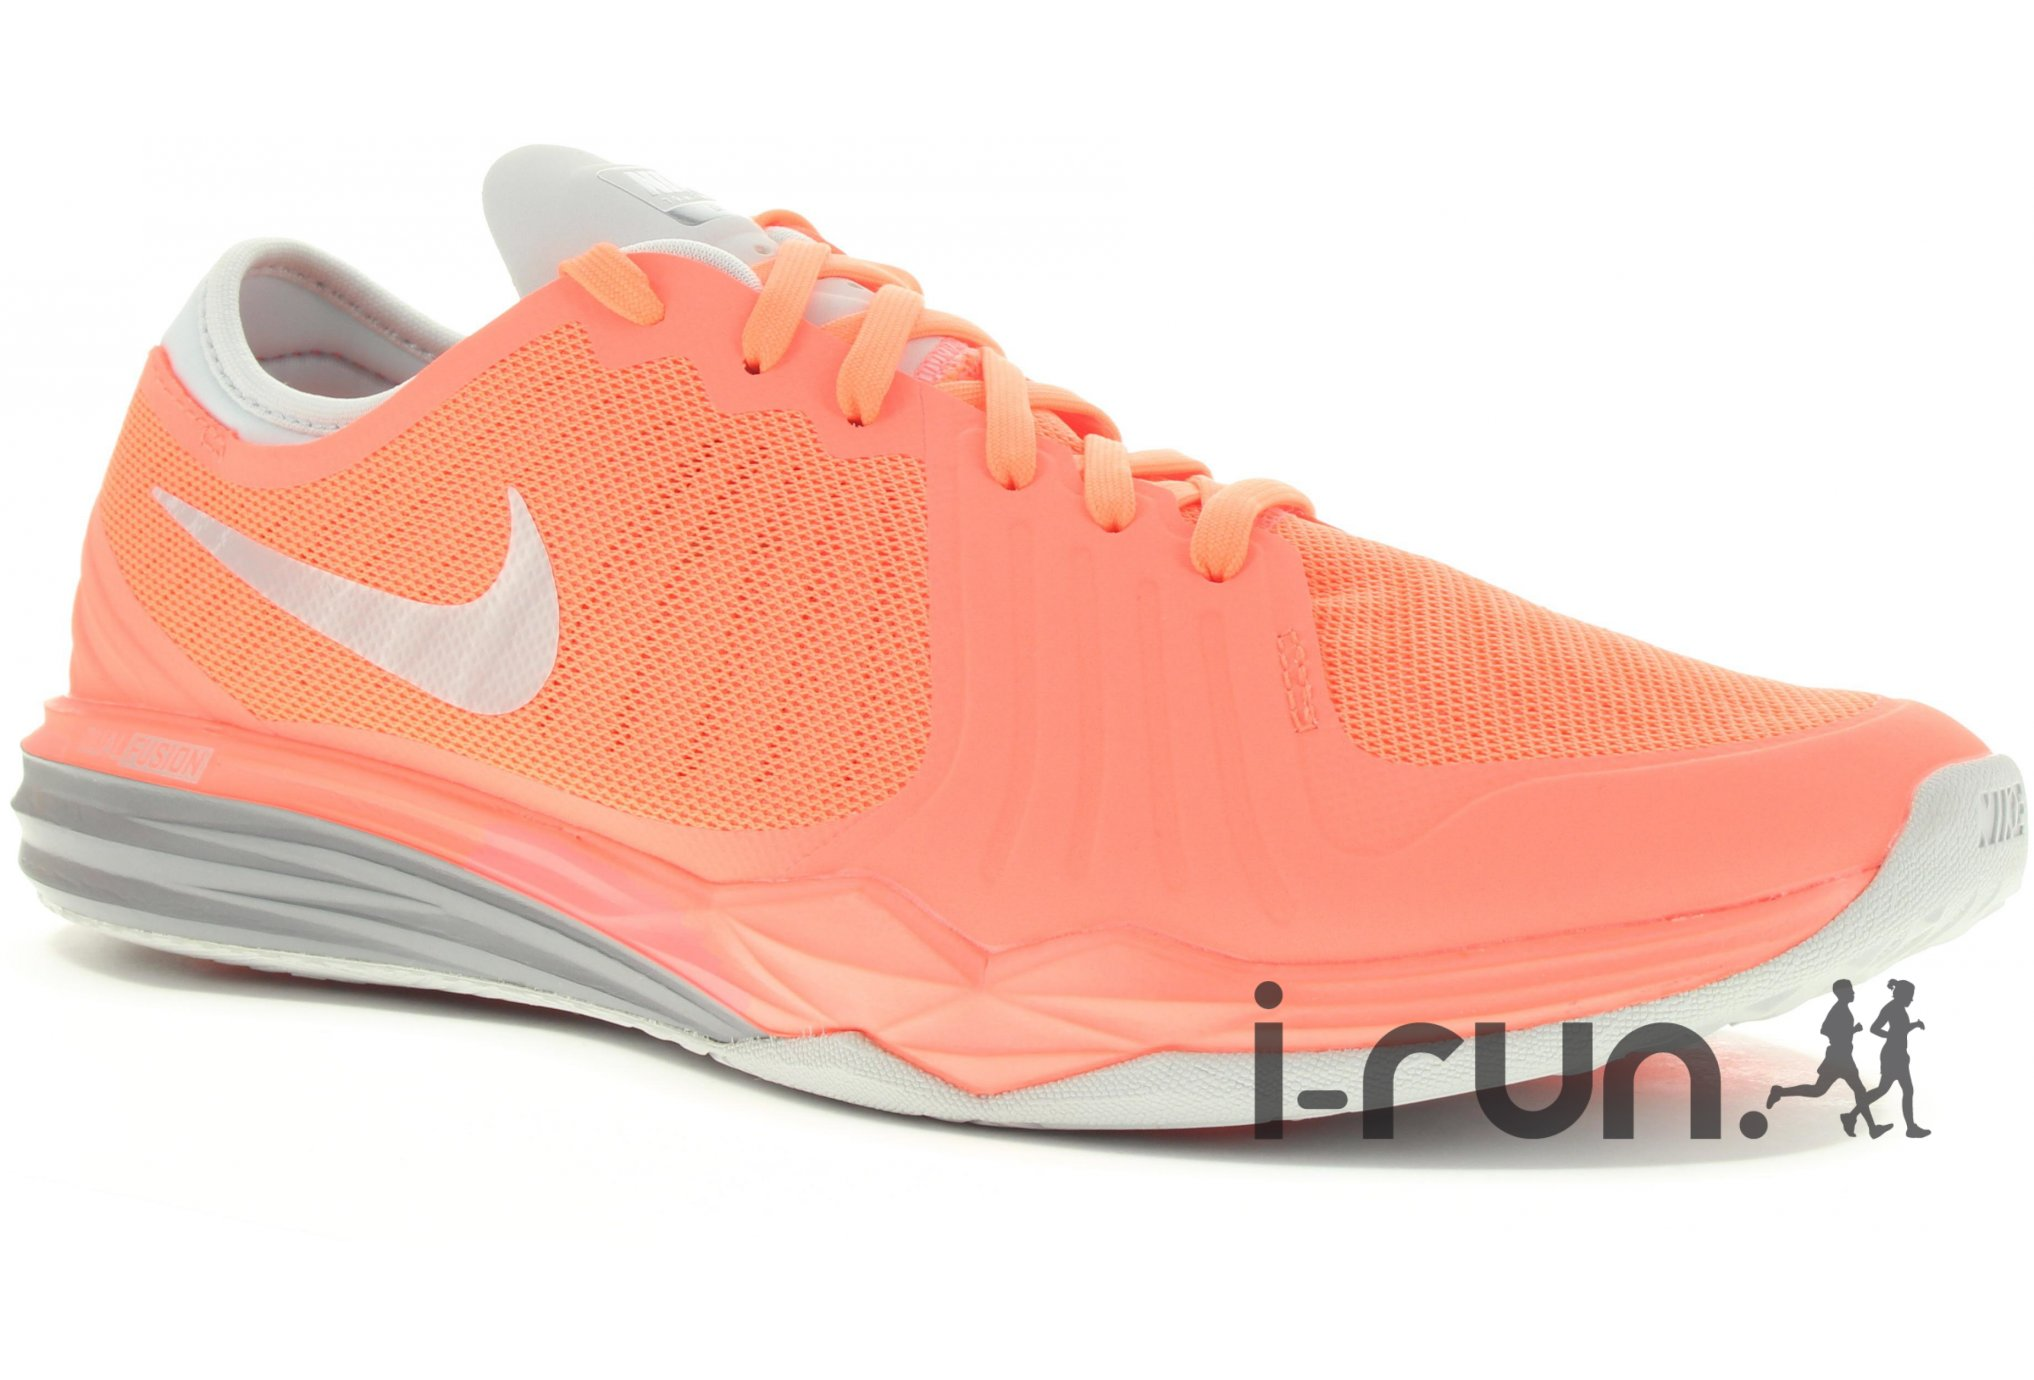 Nike dual fusion tr 4 w pas cher destockage nike running dual fusion tr 4 w - Destockage fitness avis ...